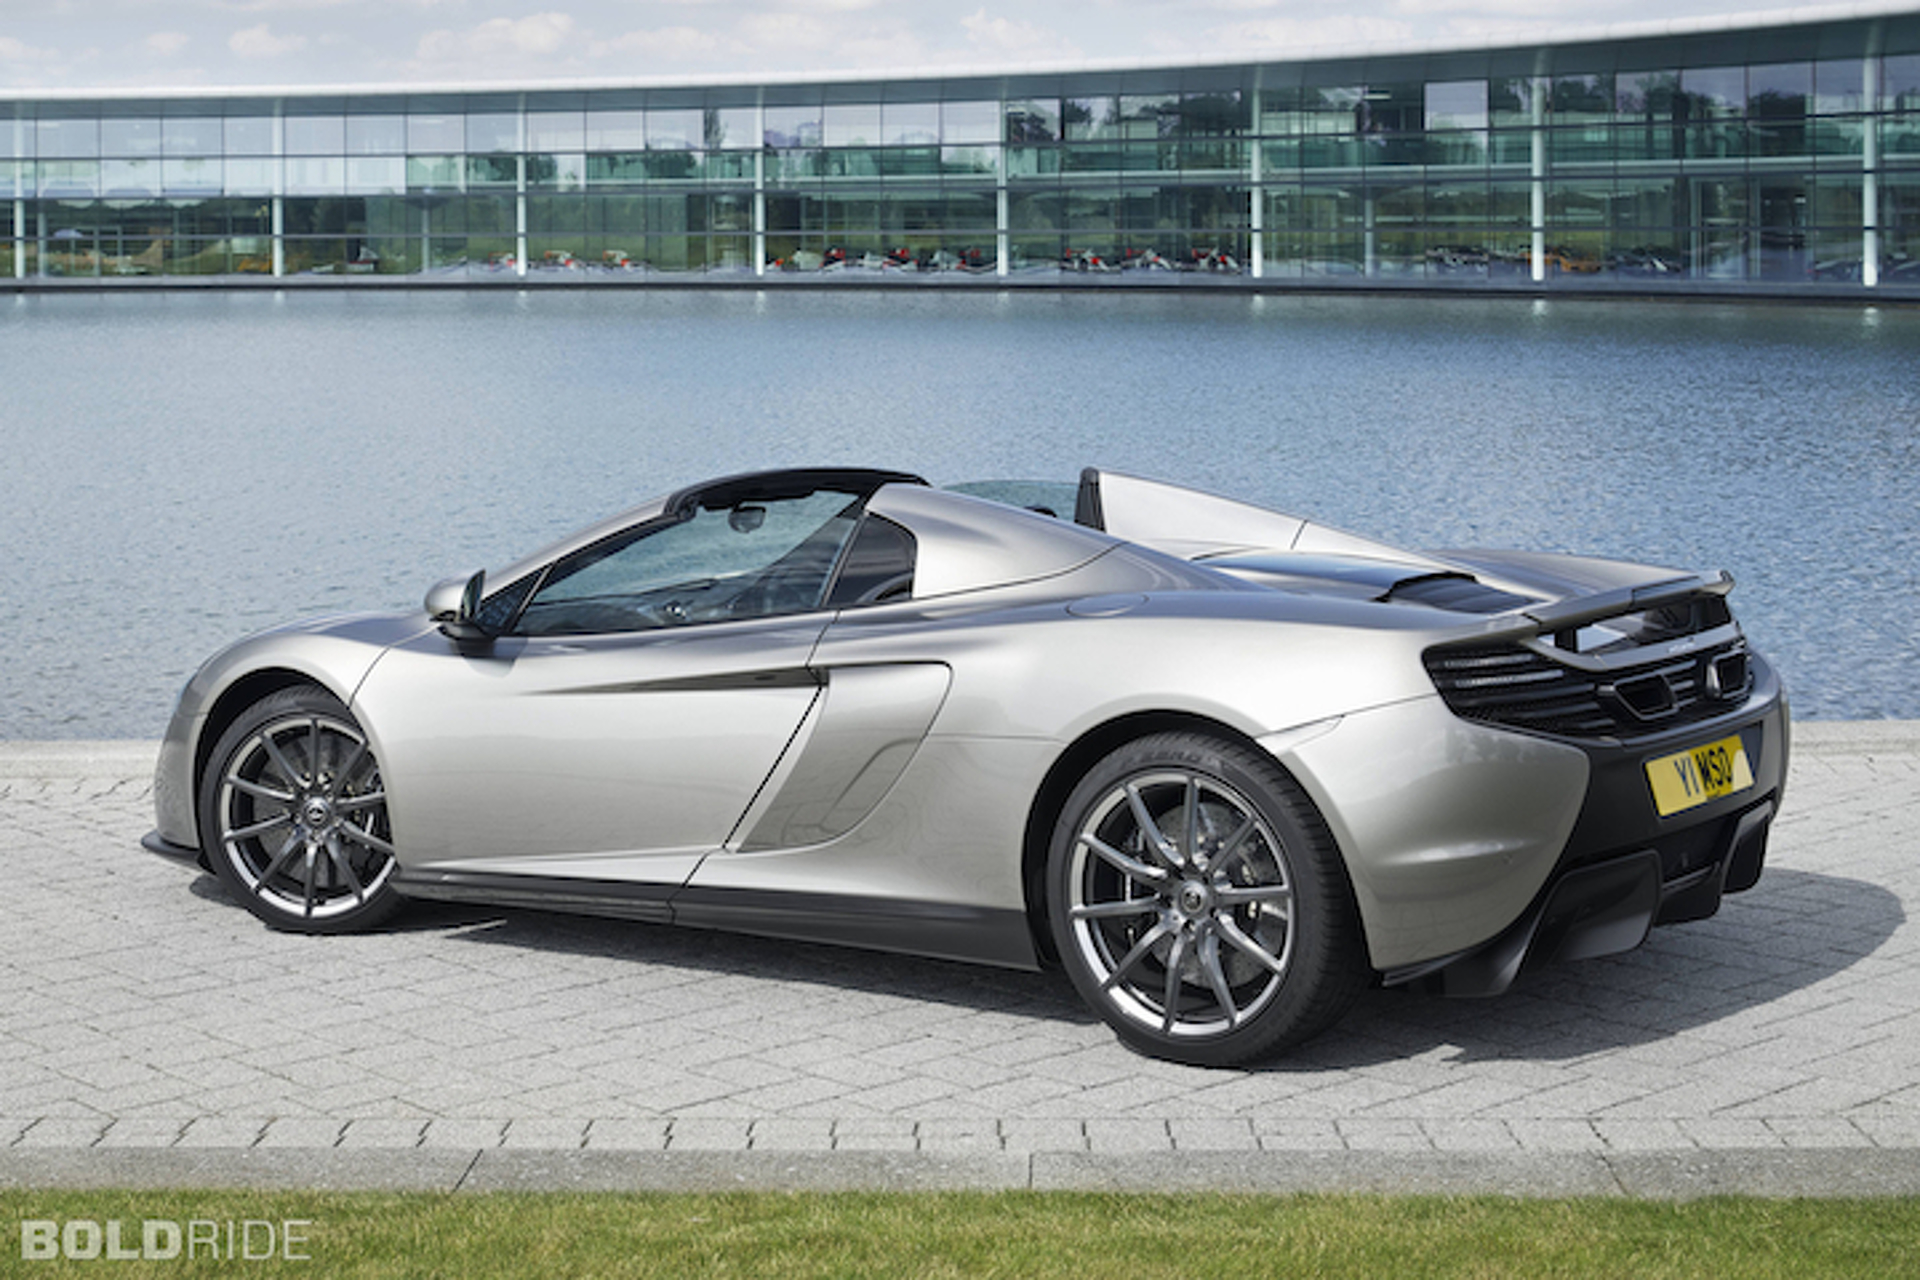 McLaren Is Building An Even More Hardcore 650S Spider